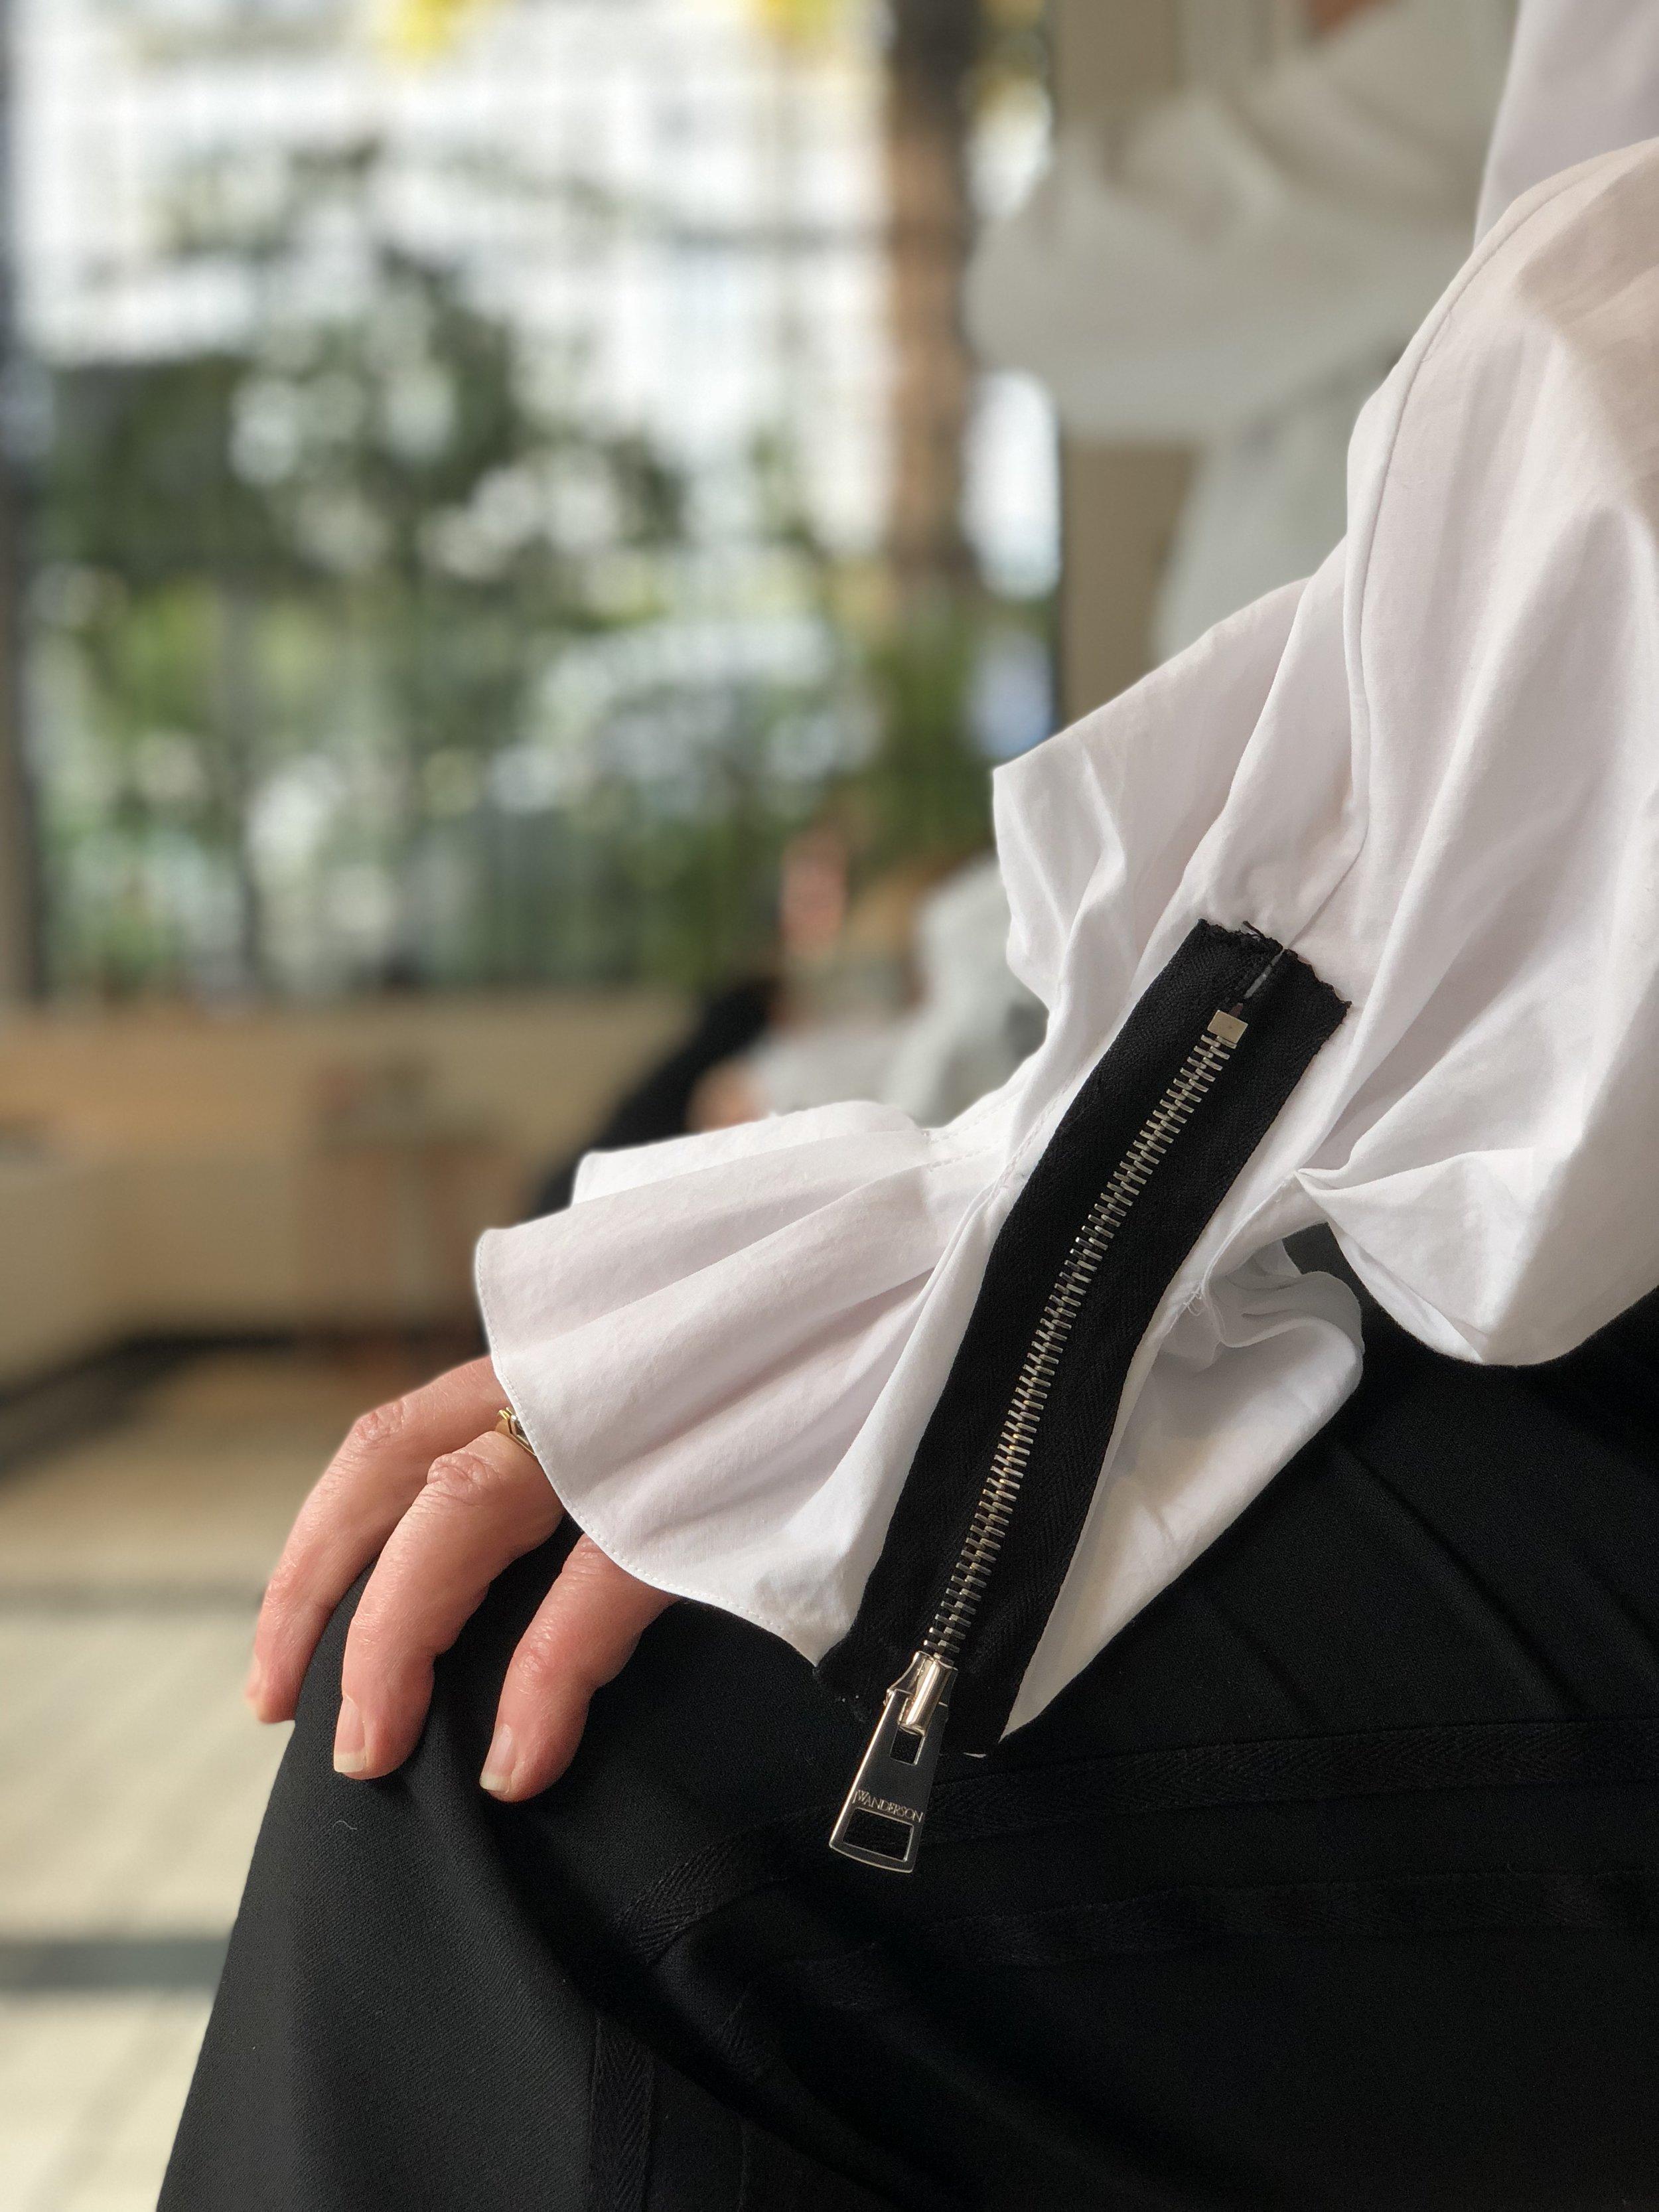 Those sleeves.